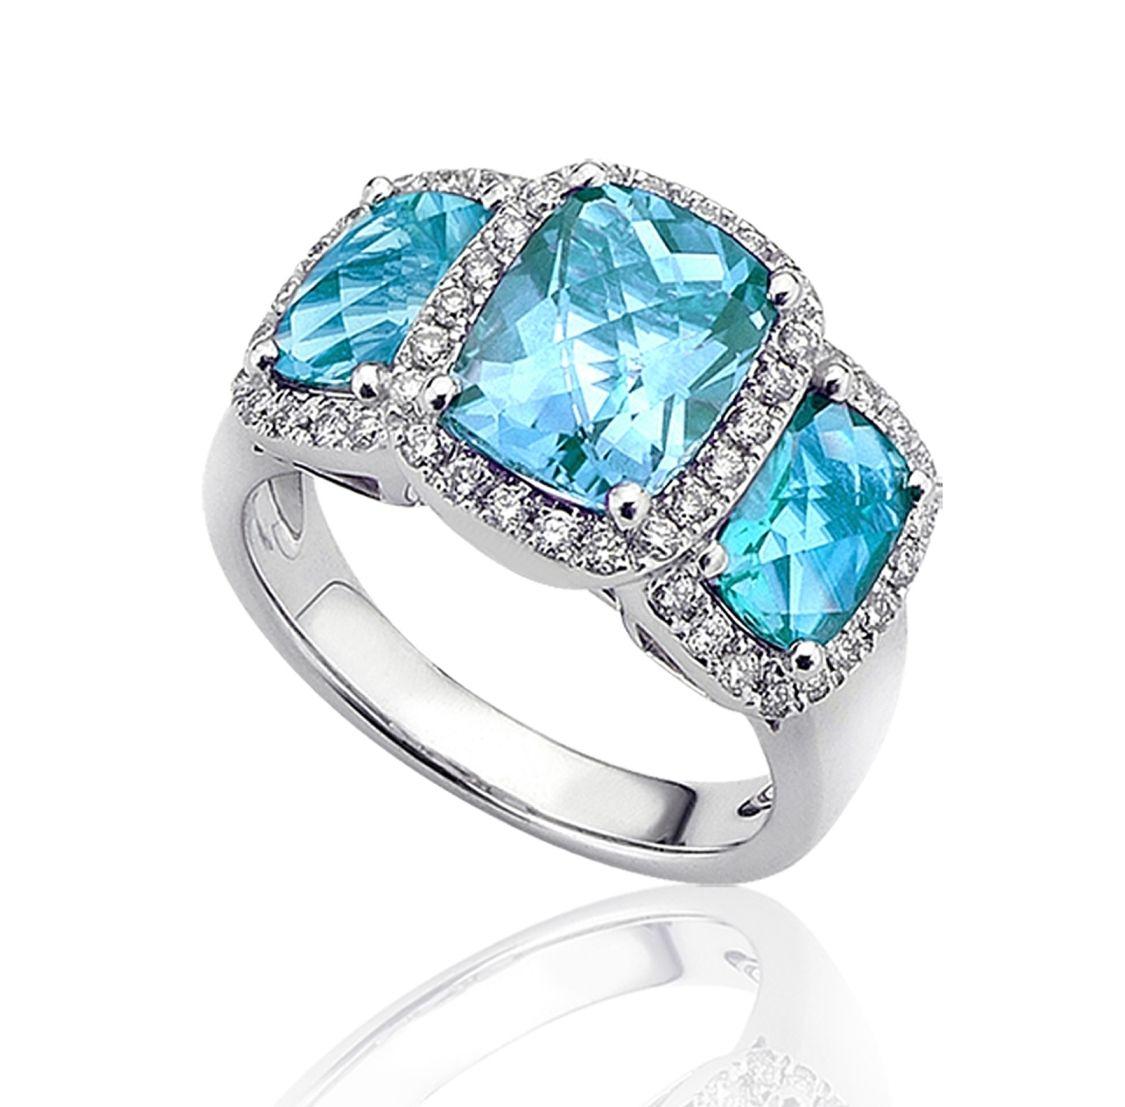 Triple Blue Topaz and Diamond Ring